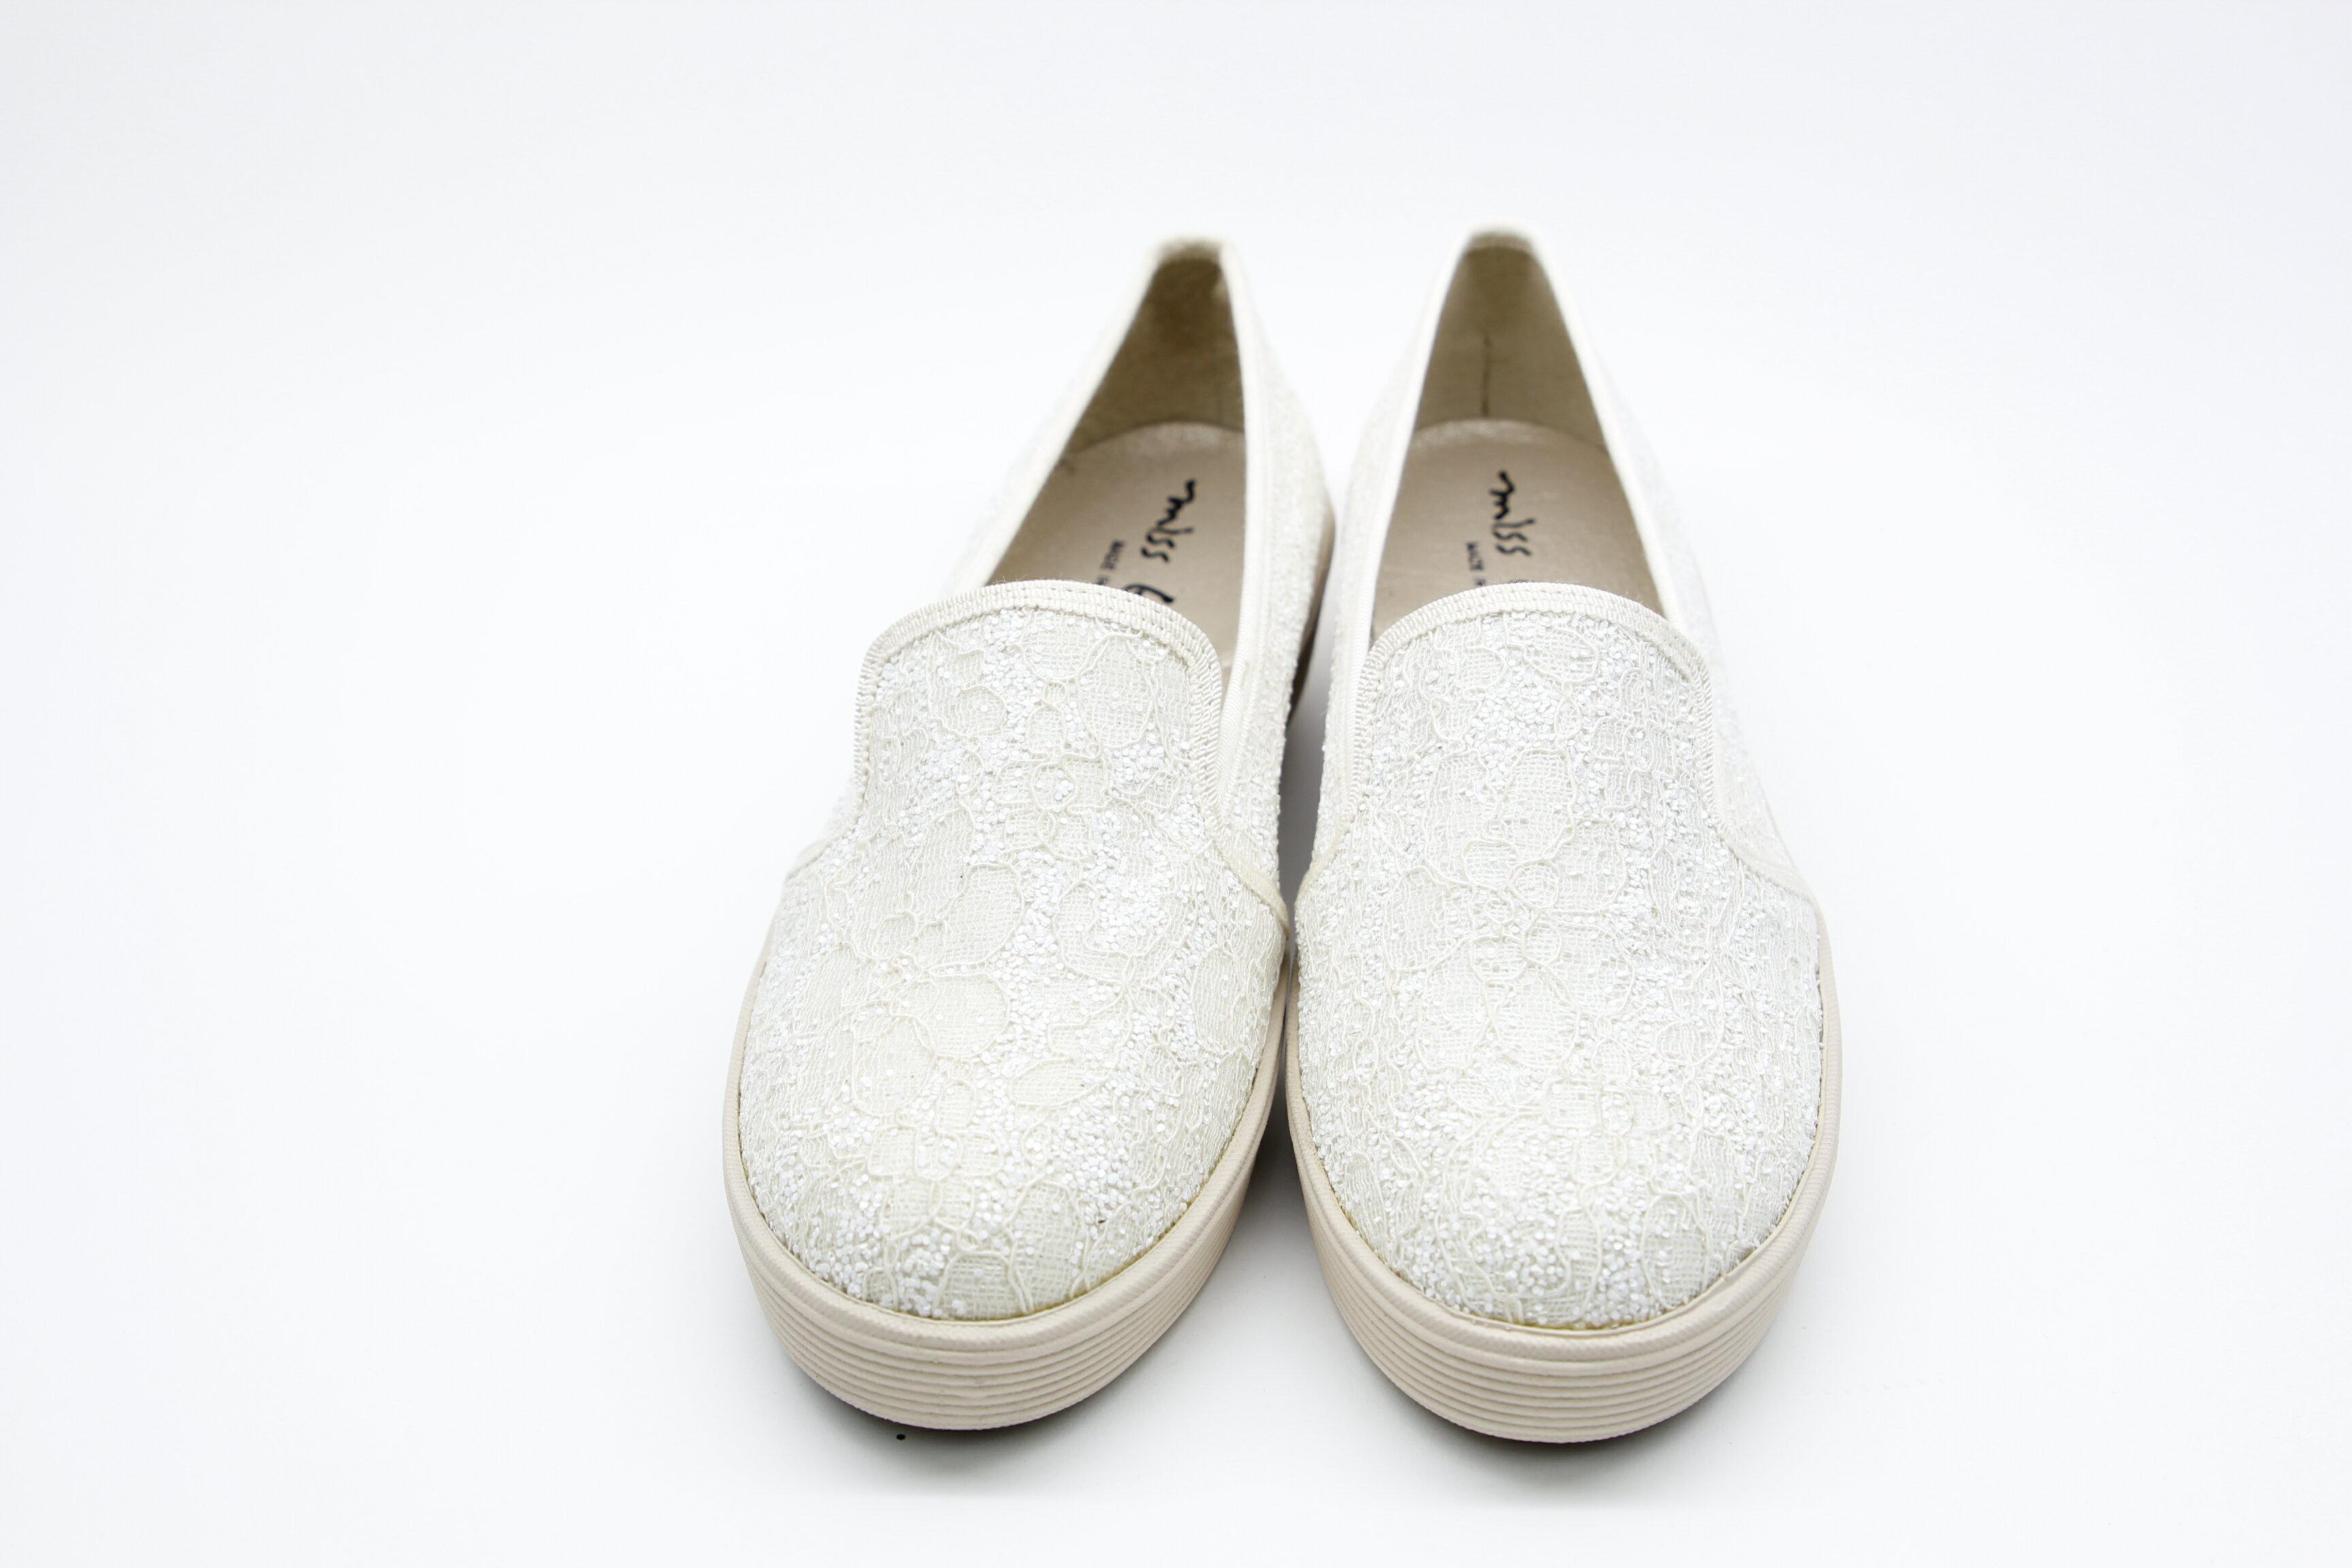 Aimez La Vie 超輕氣墊鞋 蕾絲亮片真皮內裡腳窩樂福厚底休閒鞋